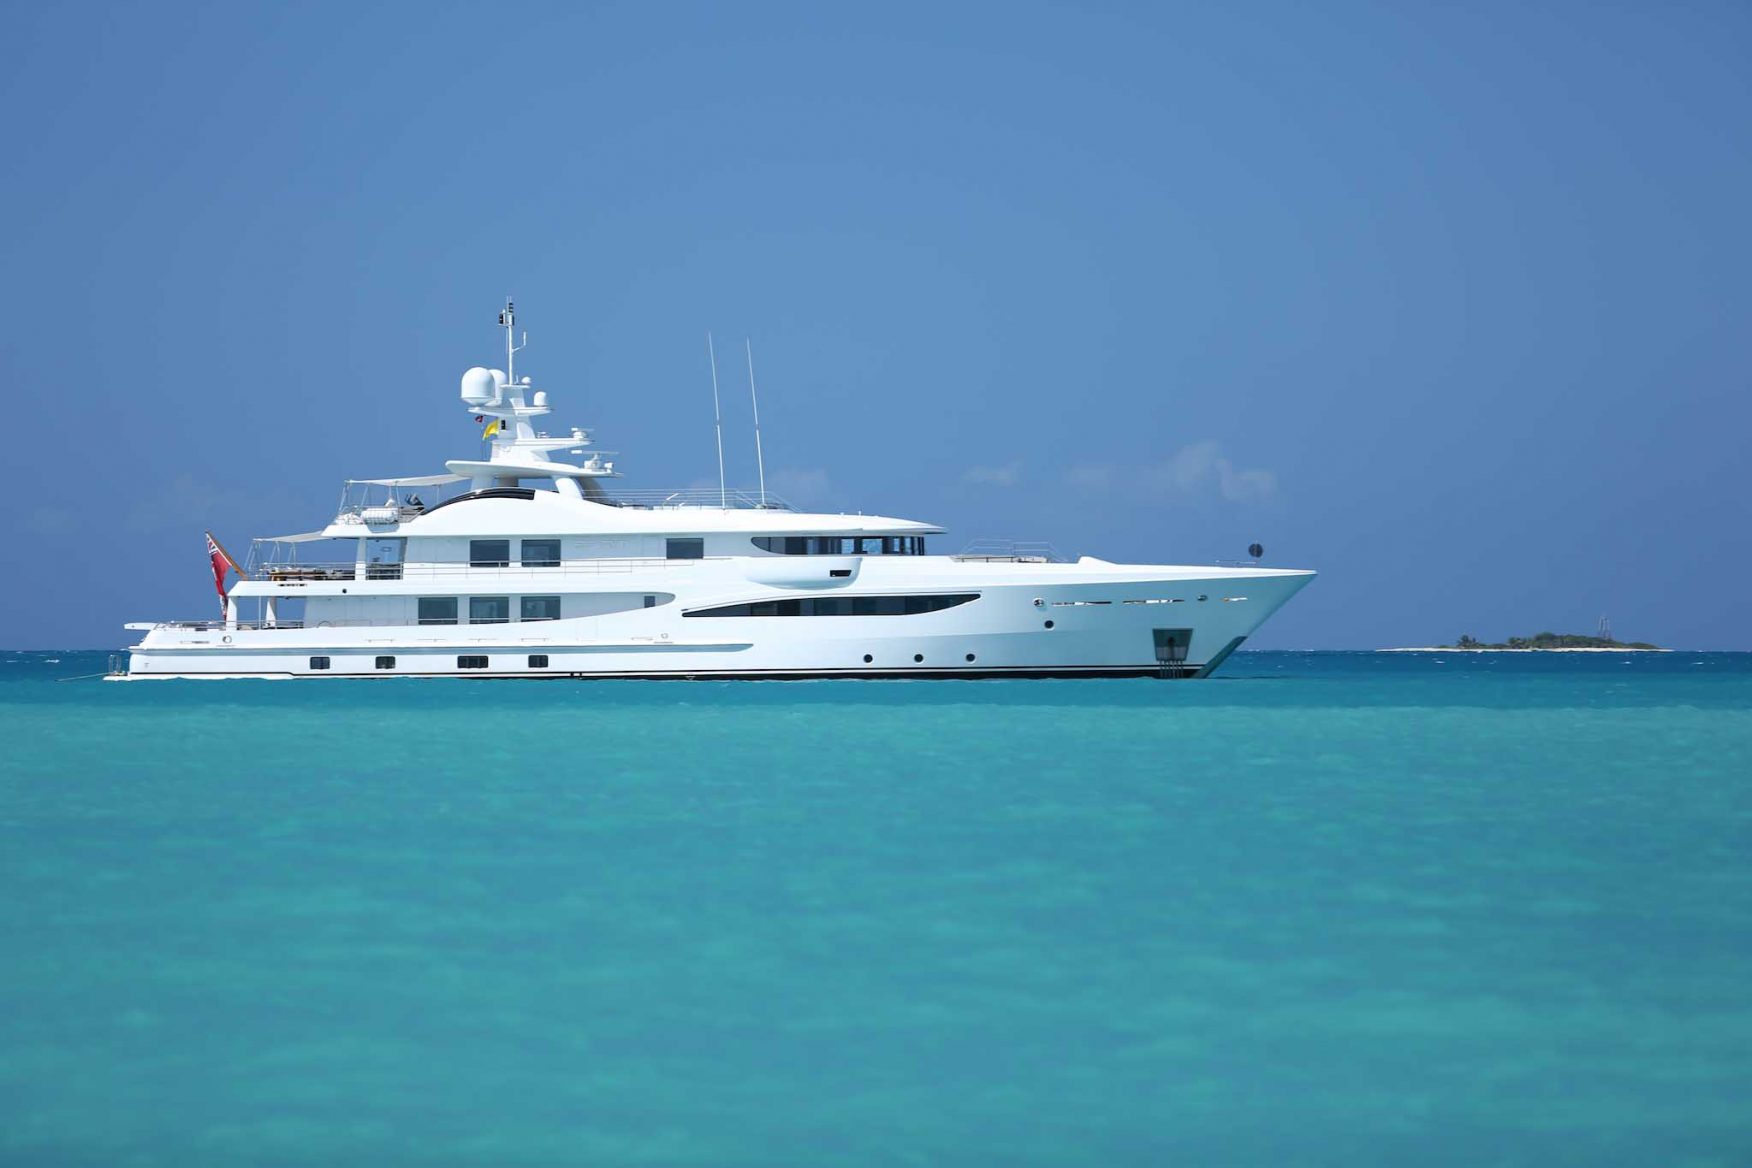 caribbean-cruising-pirate-quest-8